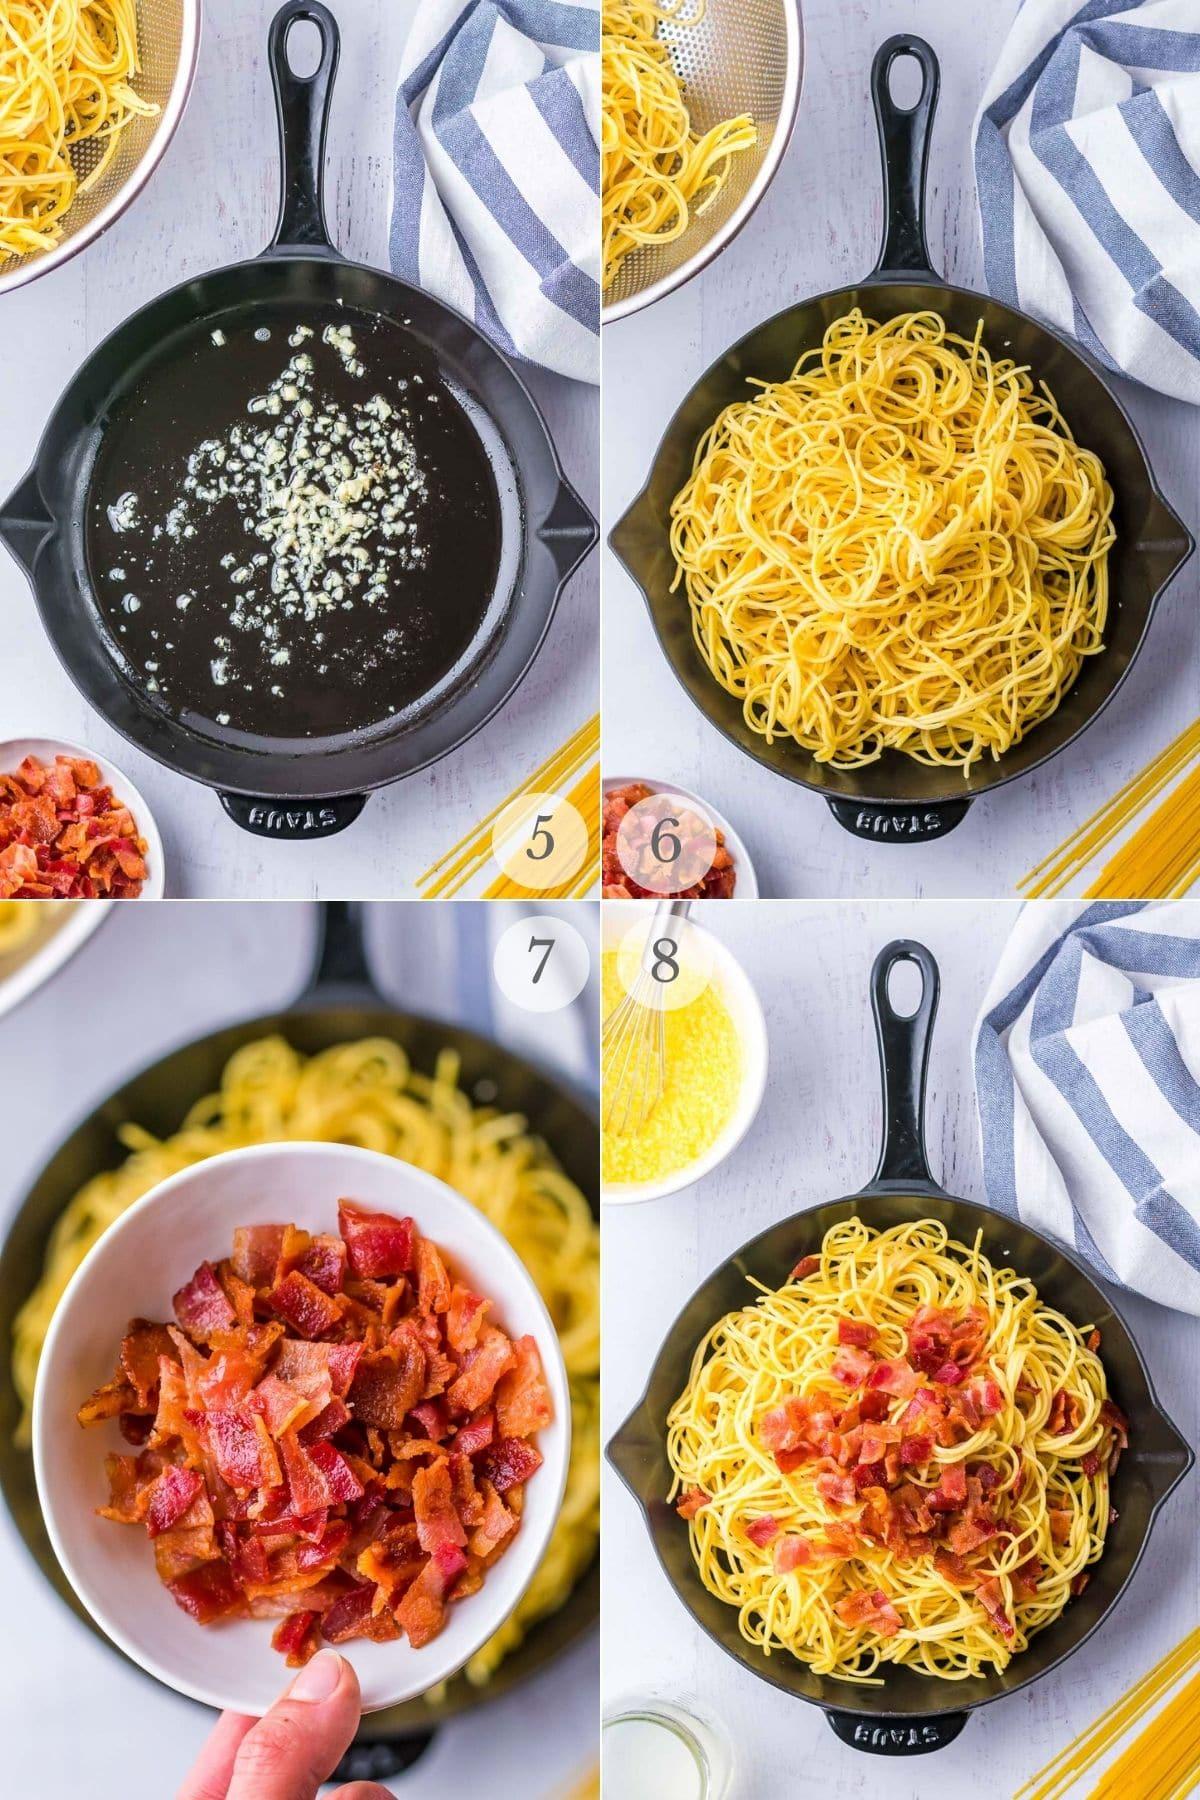 spaghetti carbonara recipe steps 5-8